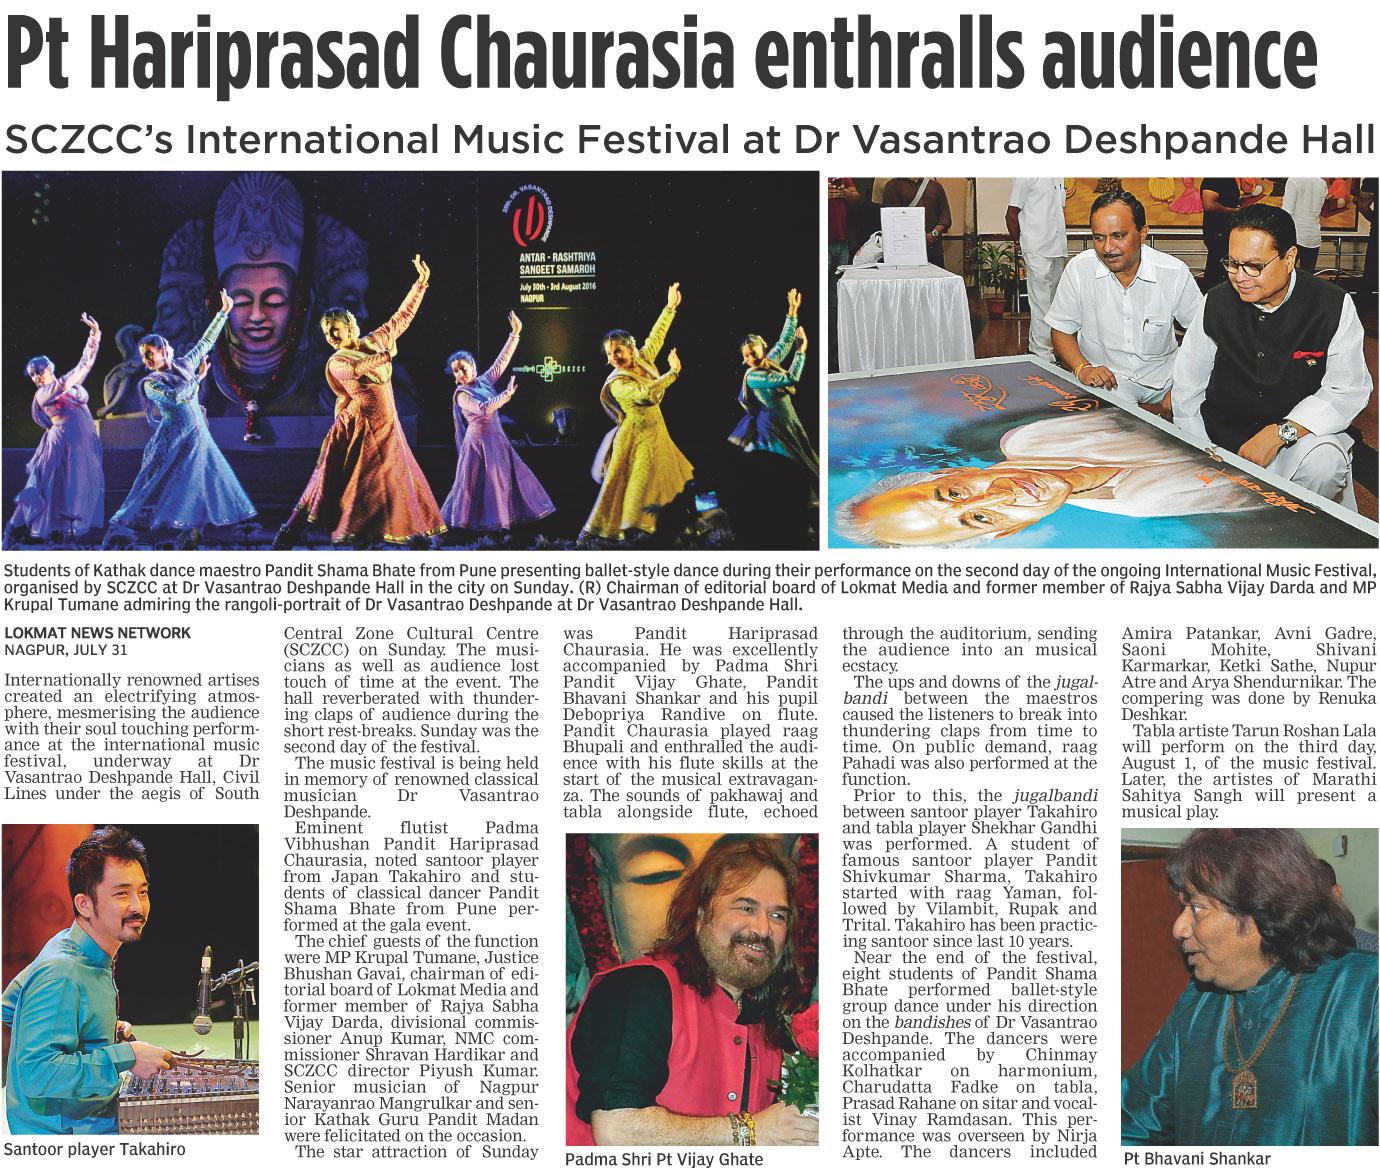 Pt Hariprasad Chaurasia enthralls audience